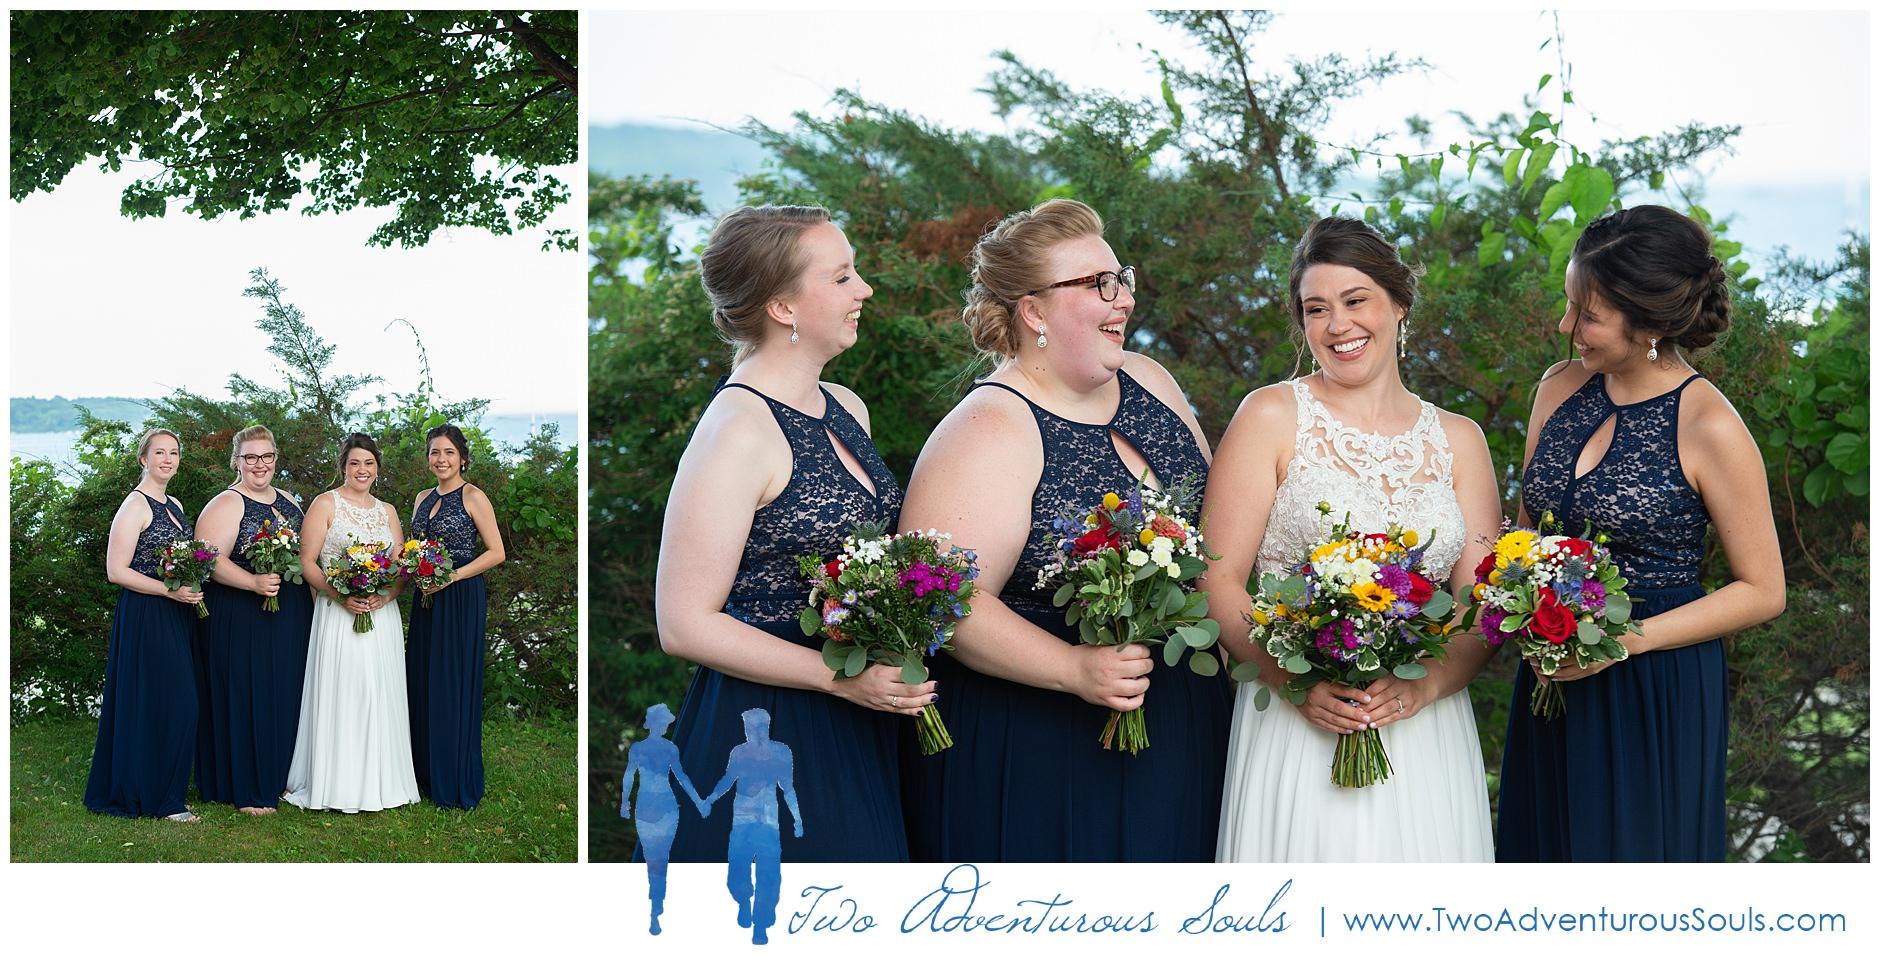 Maine Wedding Photographers, SMCC Wedding Photographers, Southern Maine Community College Wedding Photographers, Two Adventurous Souls-AshleyAaron_0015.jpg